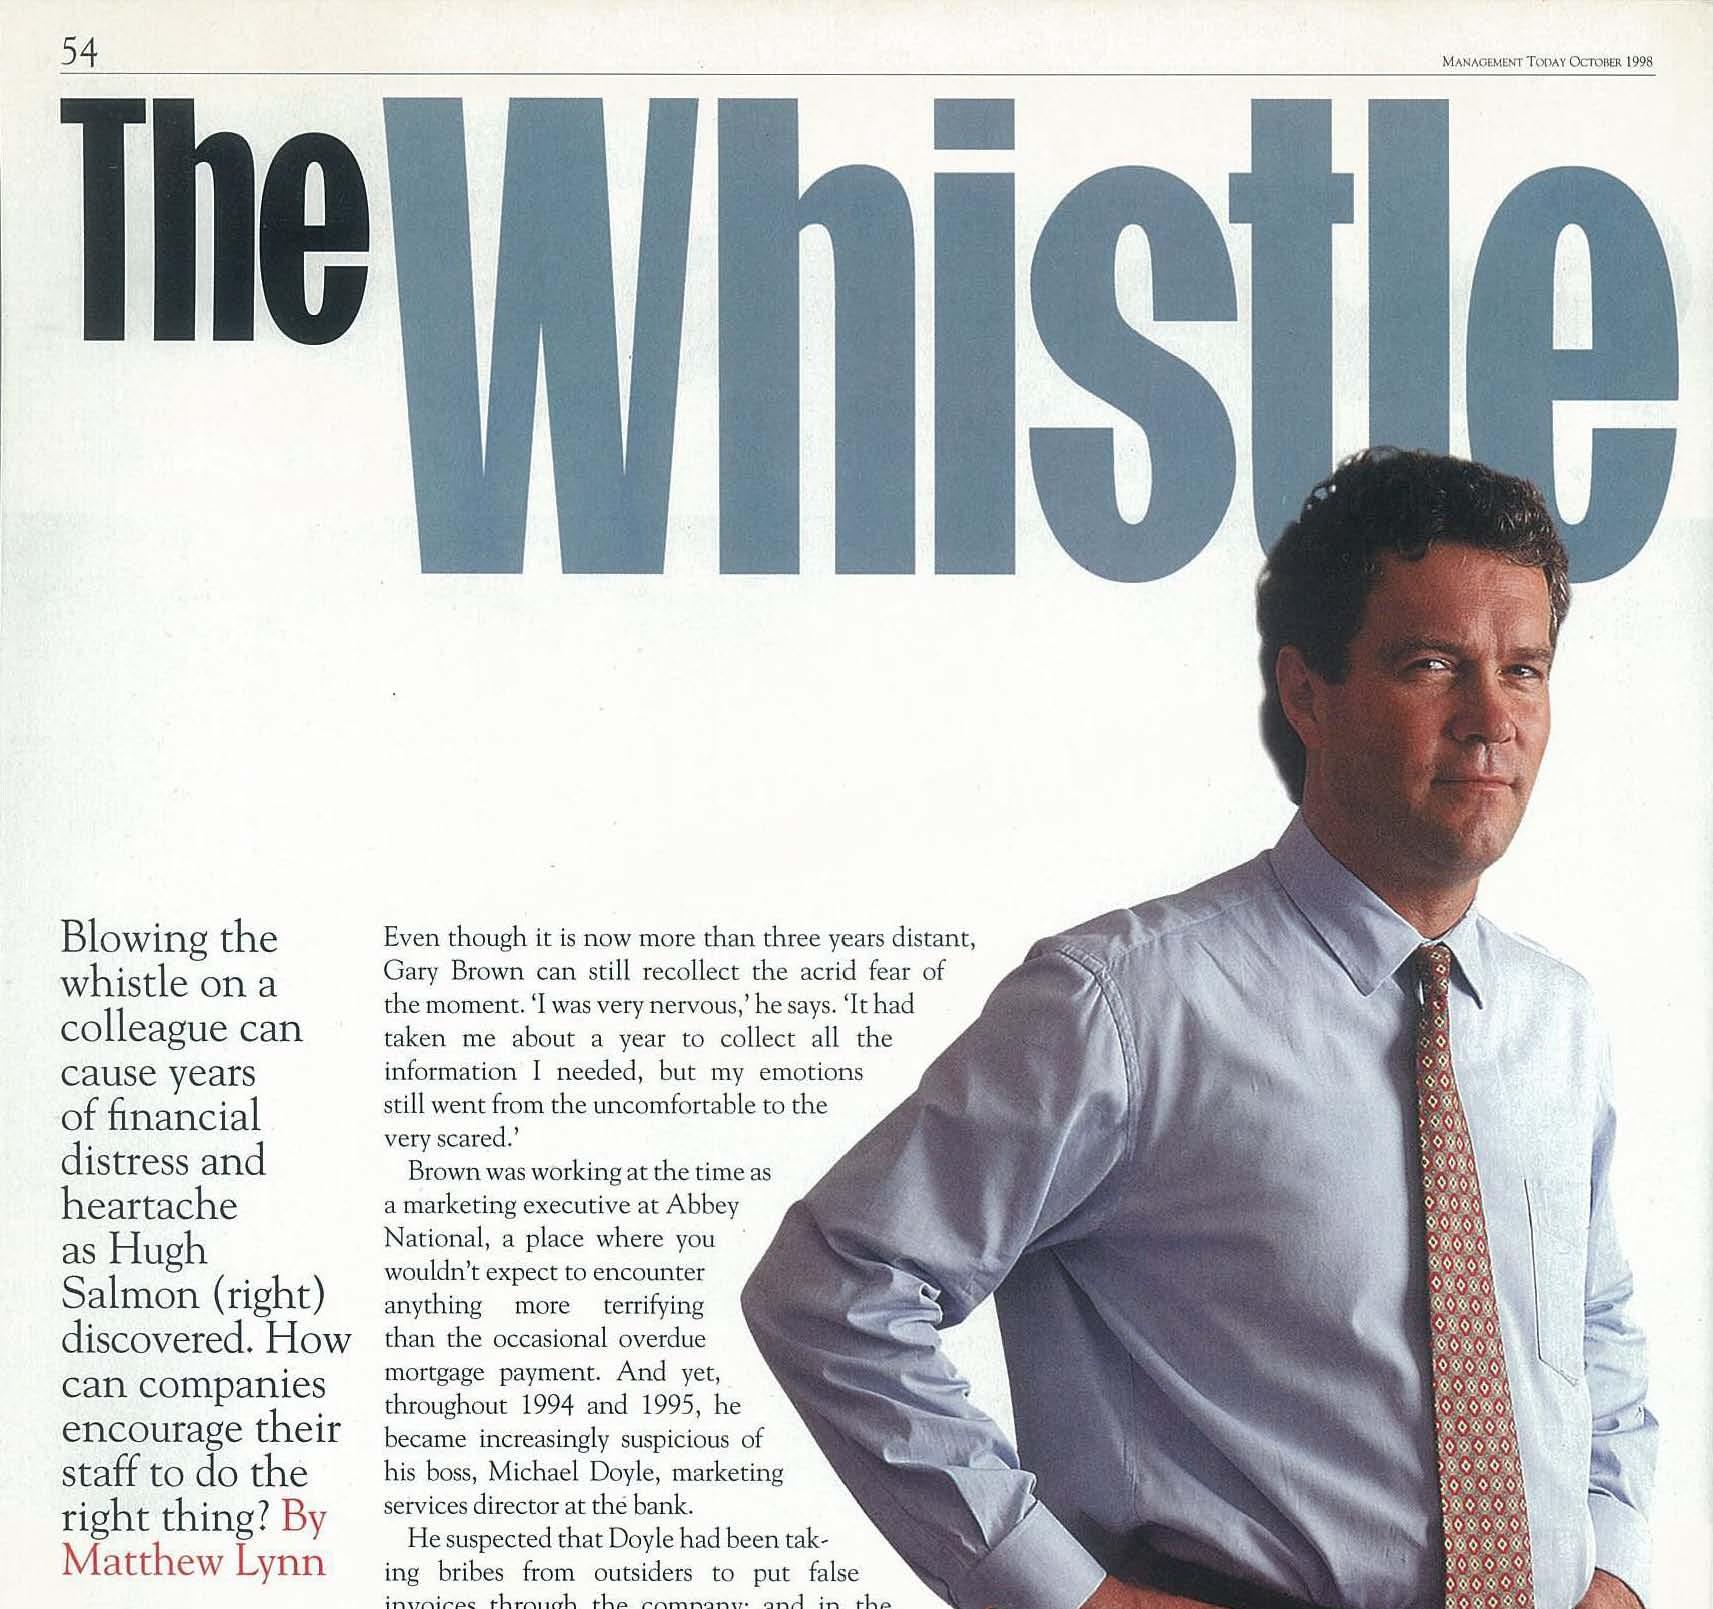 2012-05-24-WhistleblowerManagementTodayarticleCROP.jpg